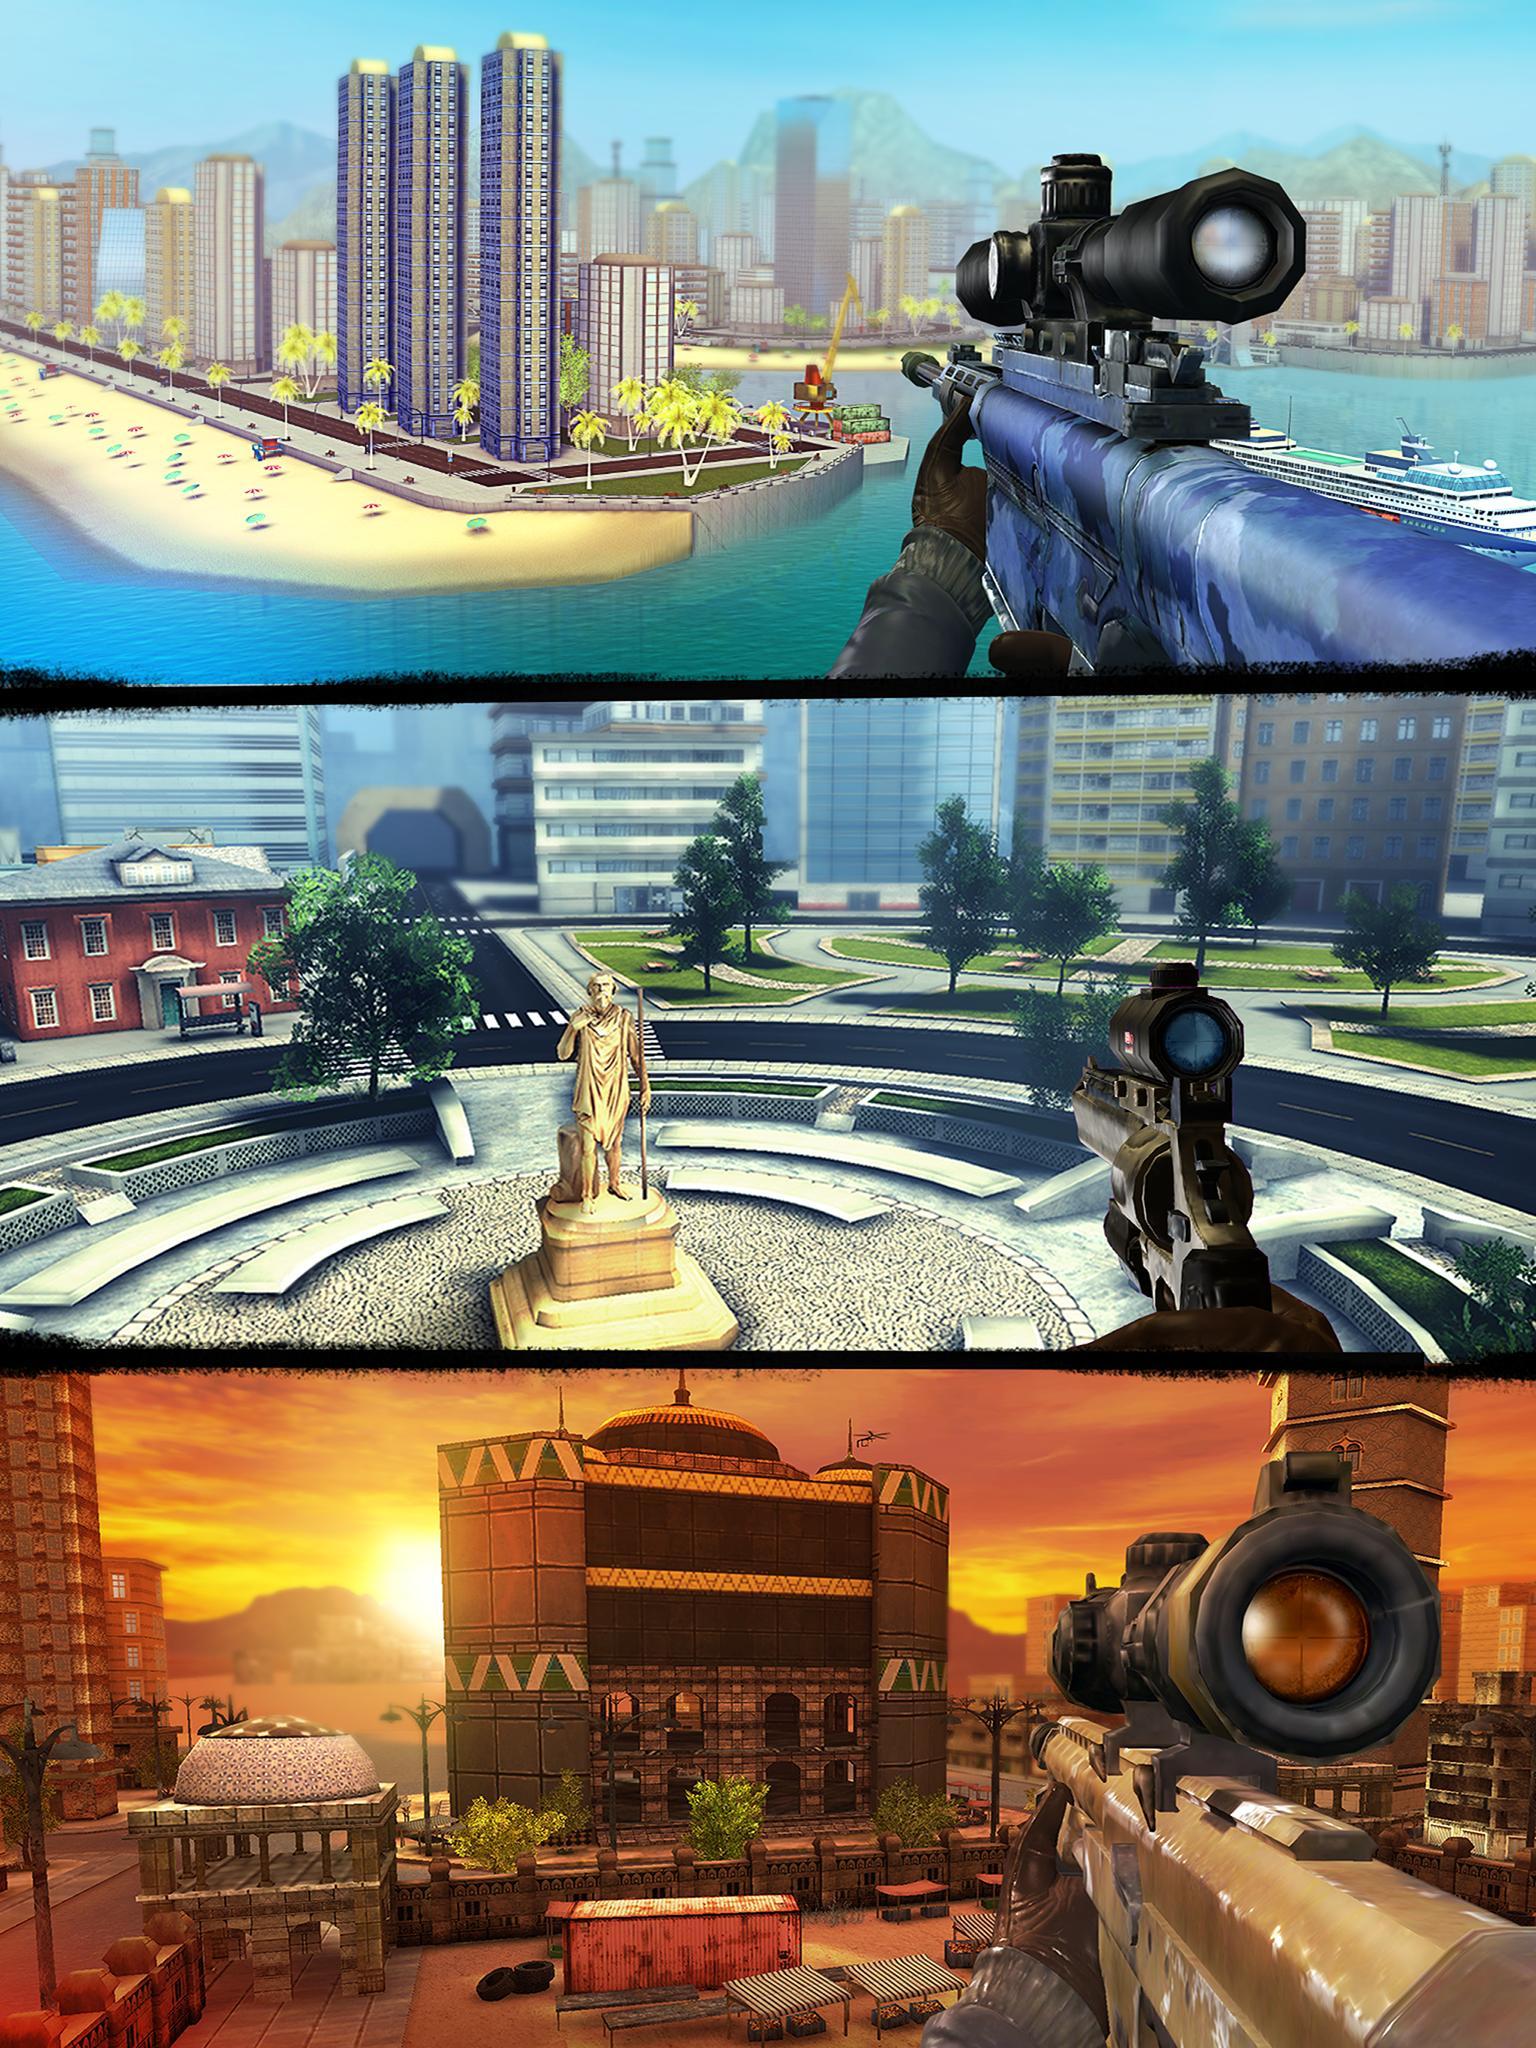 Sniper 3D Fun Free Online FPS Shooting Game 3.15.1 Screenshot 5